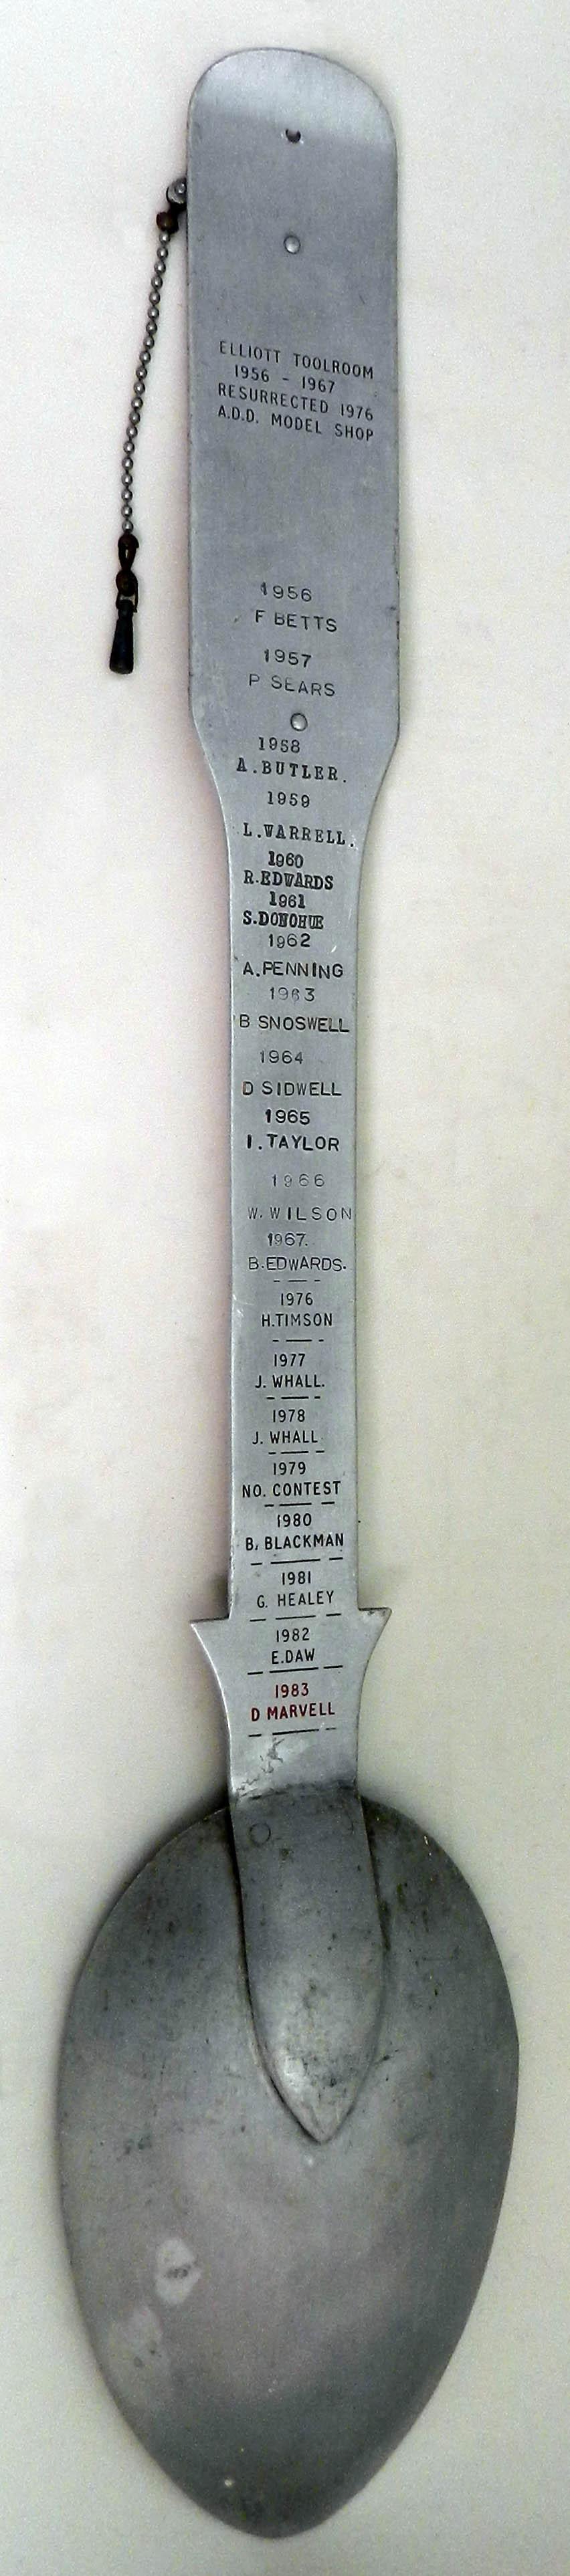 Elliott Toolroom/ADD Model Shop Award, 1956-1983 (tongue in cheek)